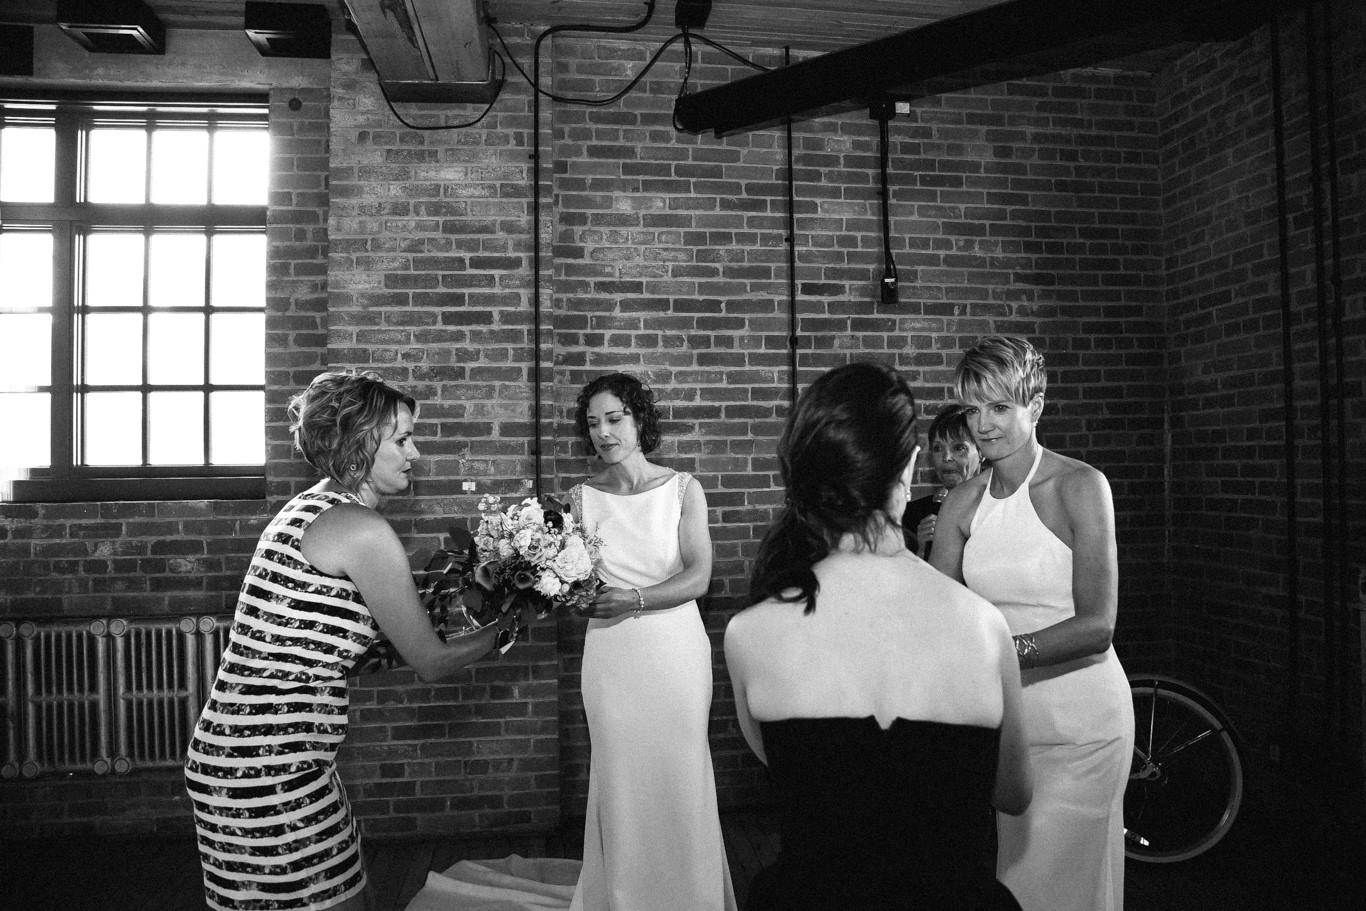 Lindsay-and-Heather-Charbar-Restaurant-Wedding-in-Calgary-79